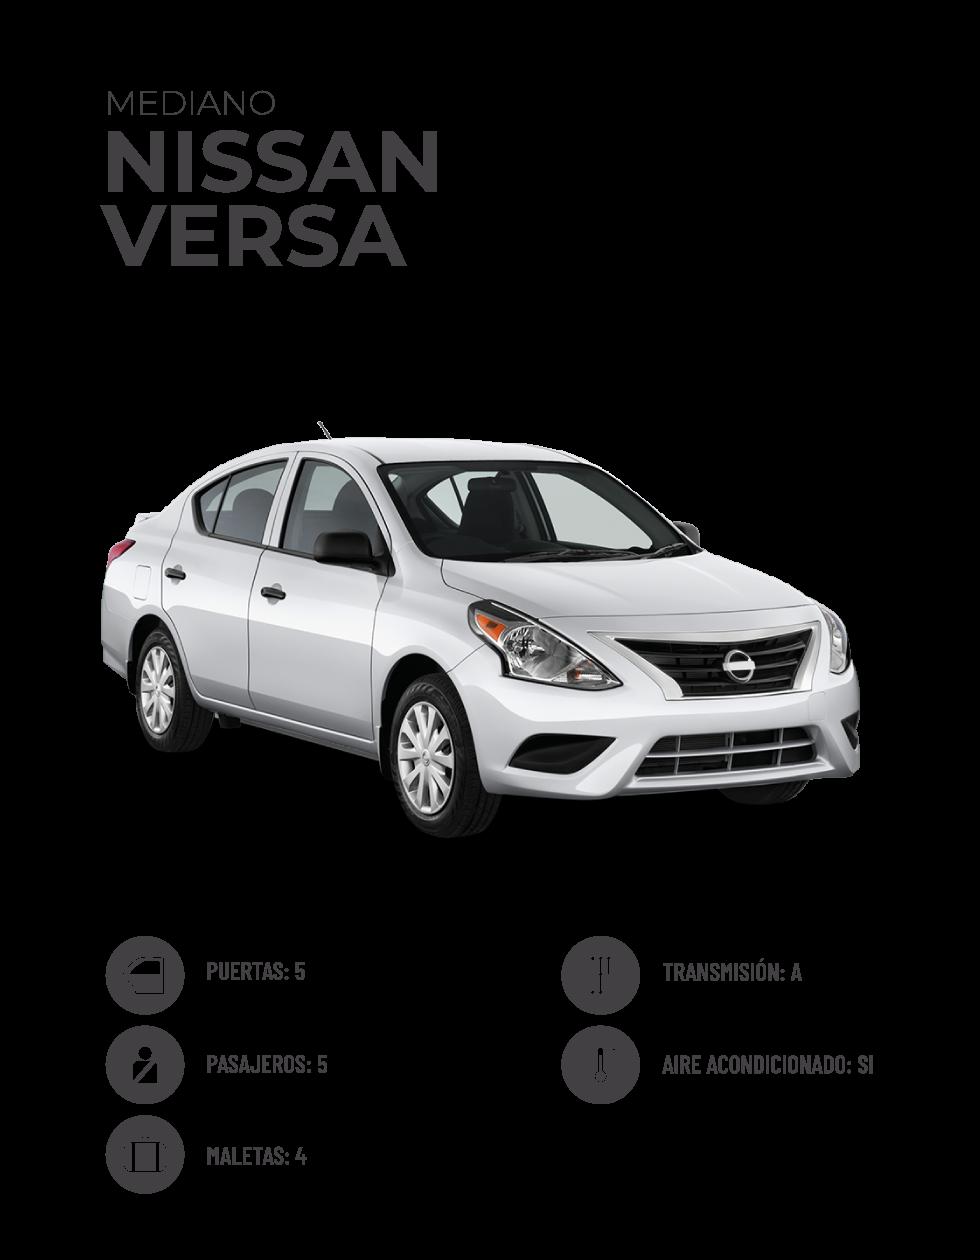 VERSA-mobile-001